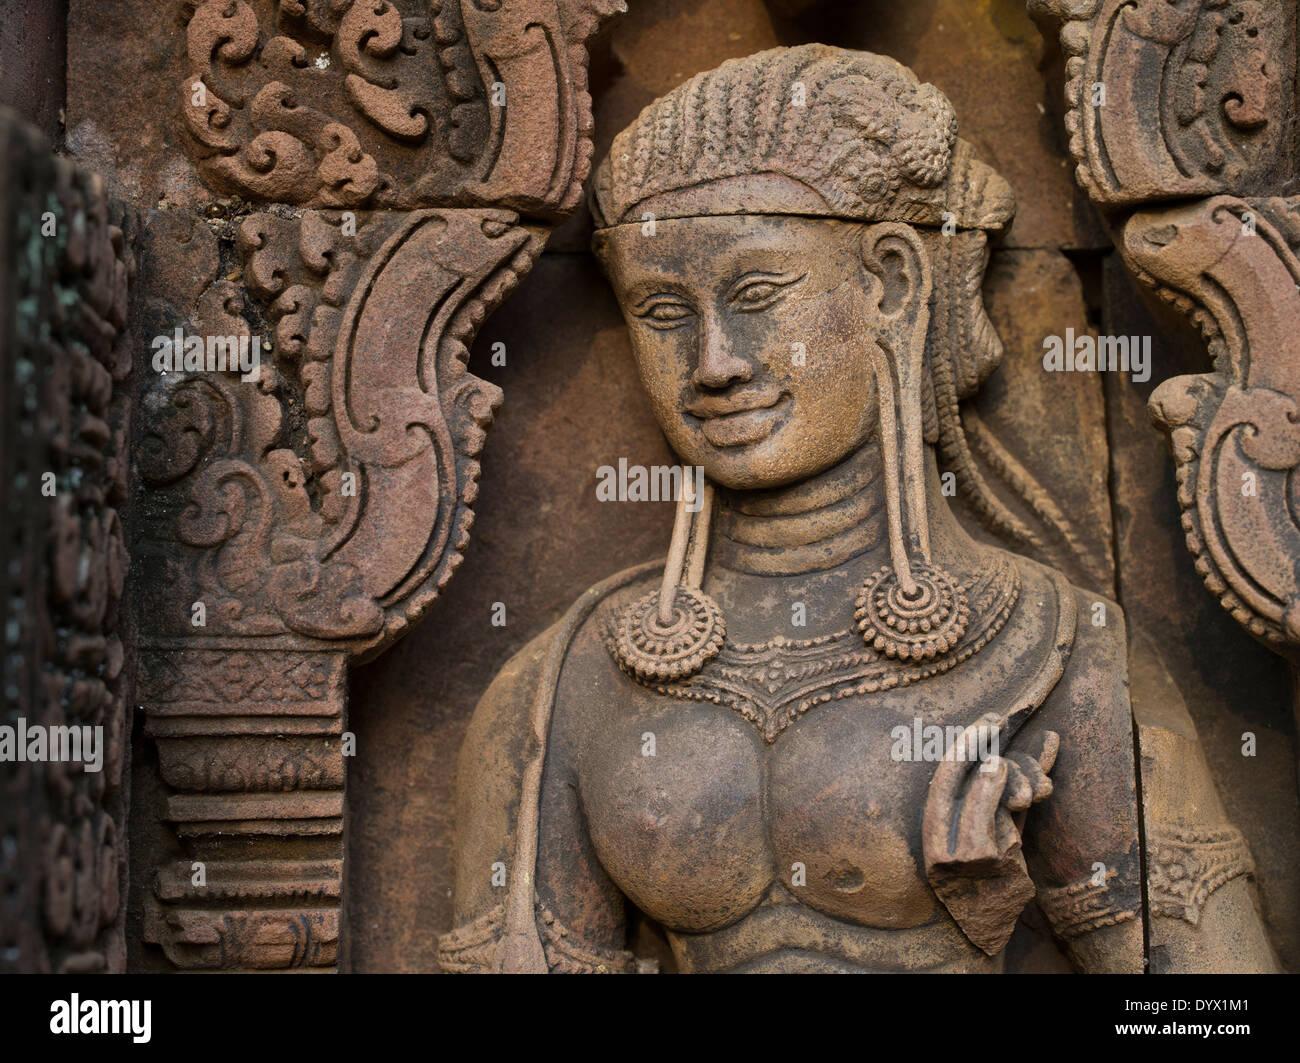 Apsara Carving al Banteay Srei tempio indù dedicato a Shiva. Siem Reap, Cambogia Immagini Stock